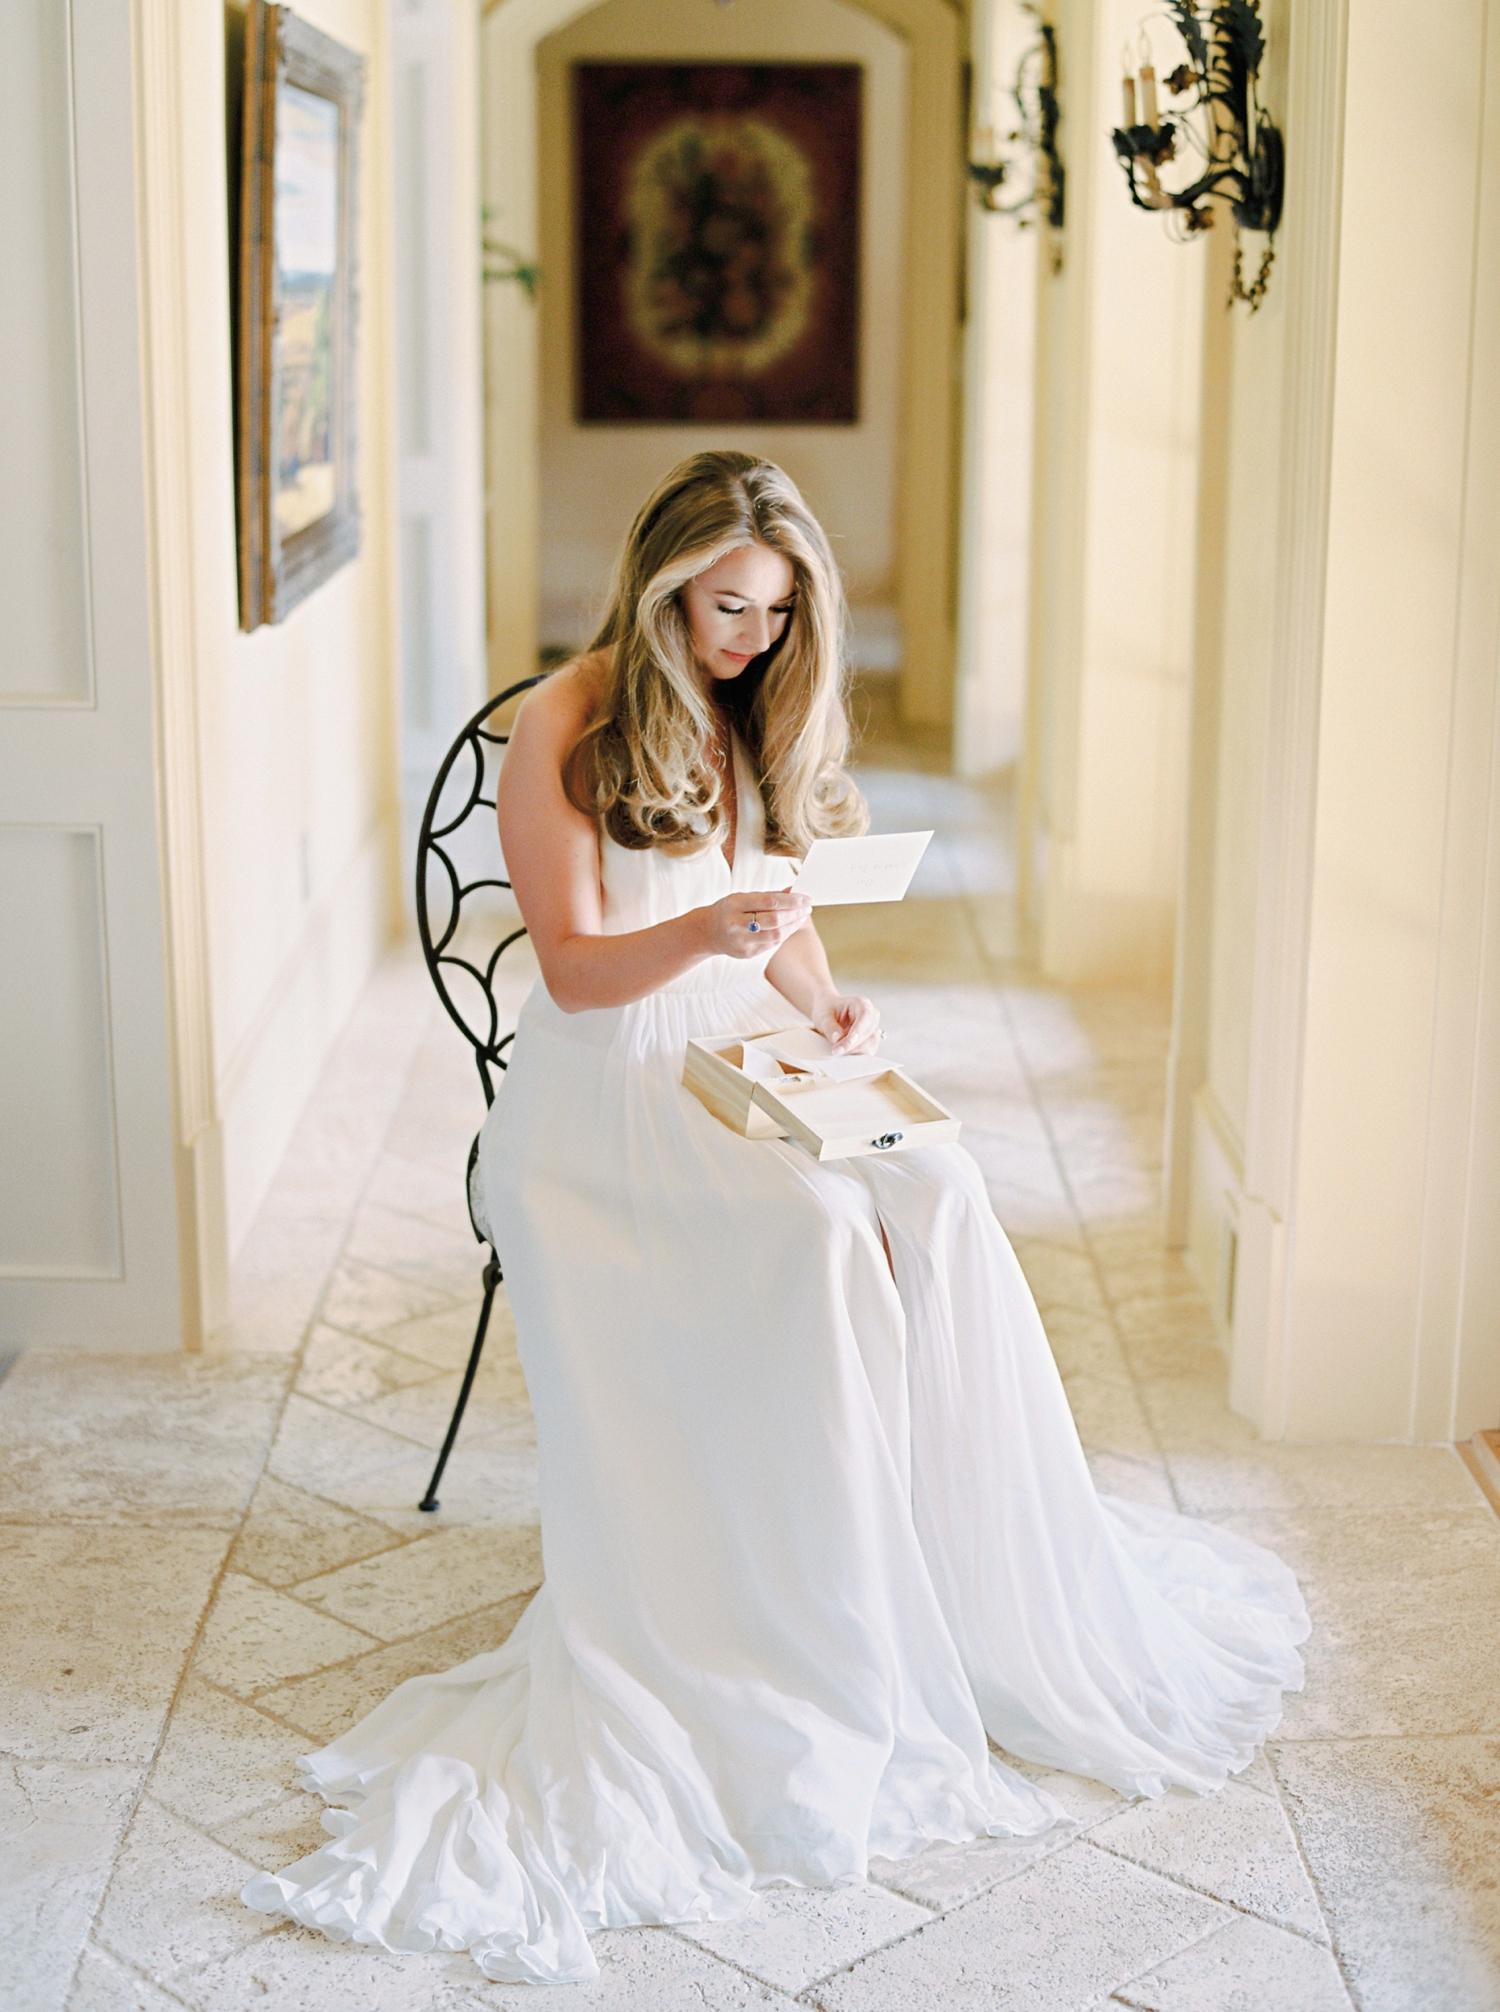 Calgary wedding photographers | georgia wedding photographers | fine art film | Justine Milton Photography | wedding details | georgia wedding | bride getting ready